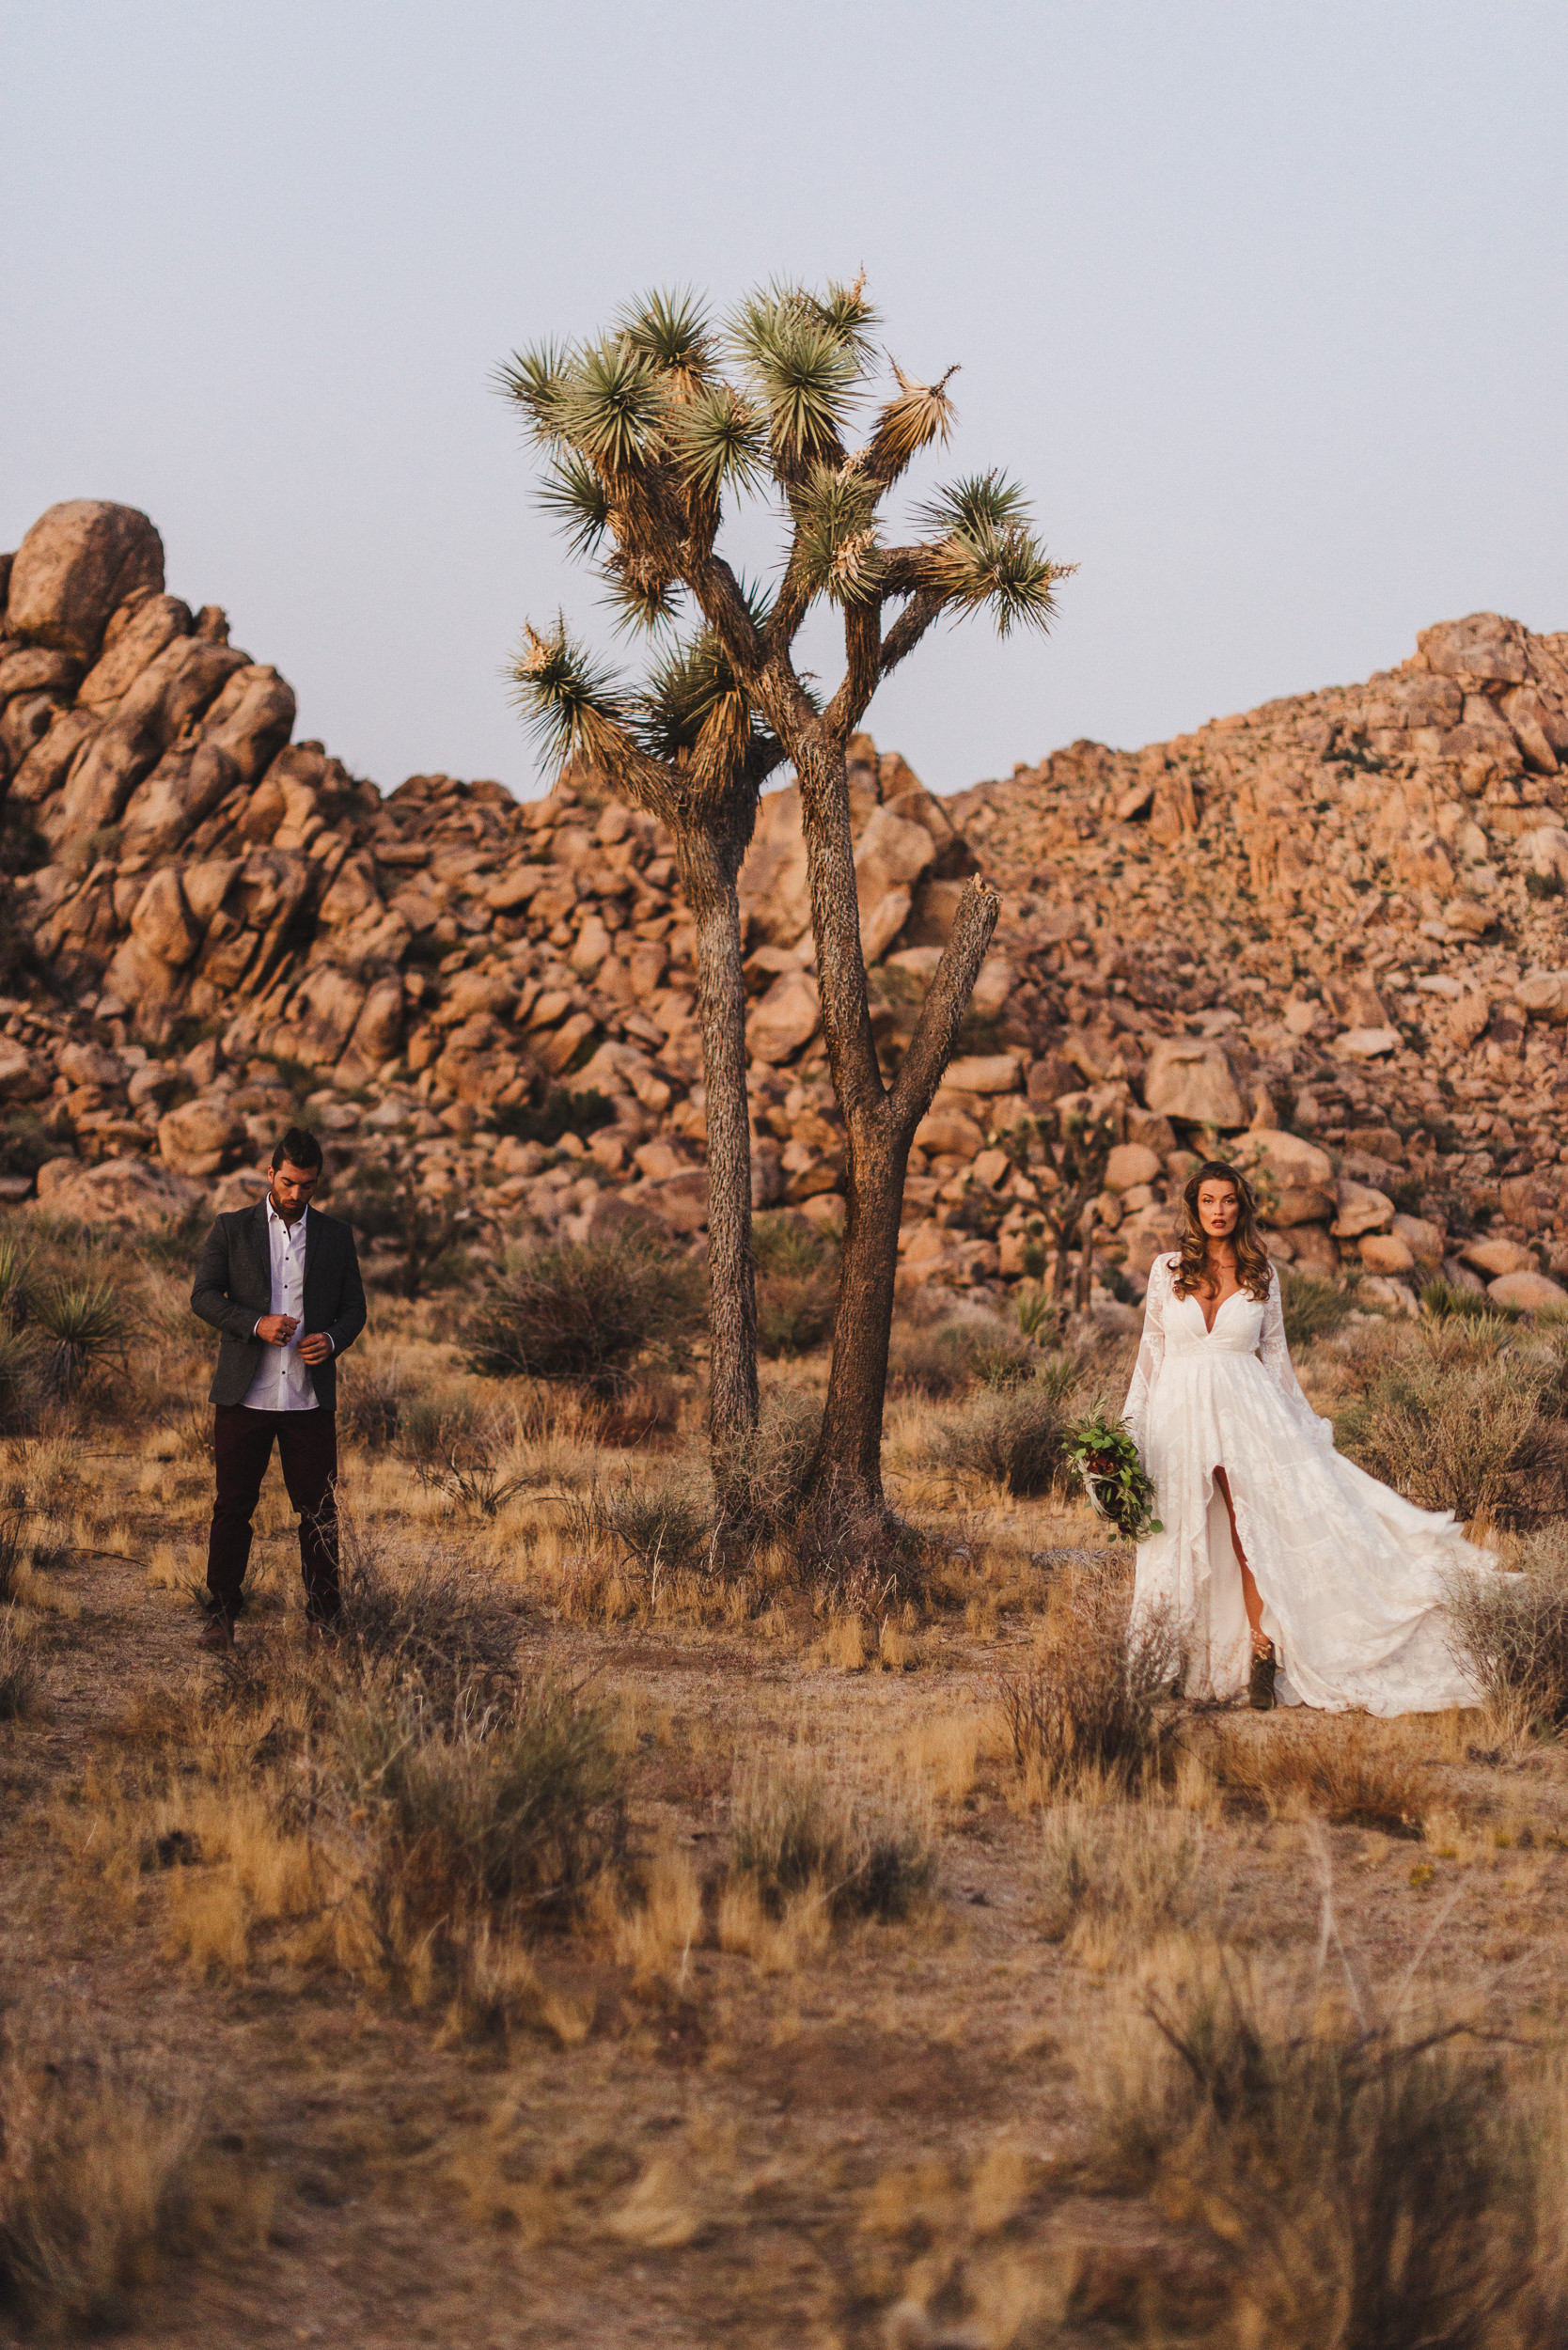 sMagdalena + Yoan - Elopement, Joshua Tree CA-169.jpg